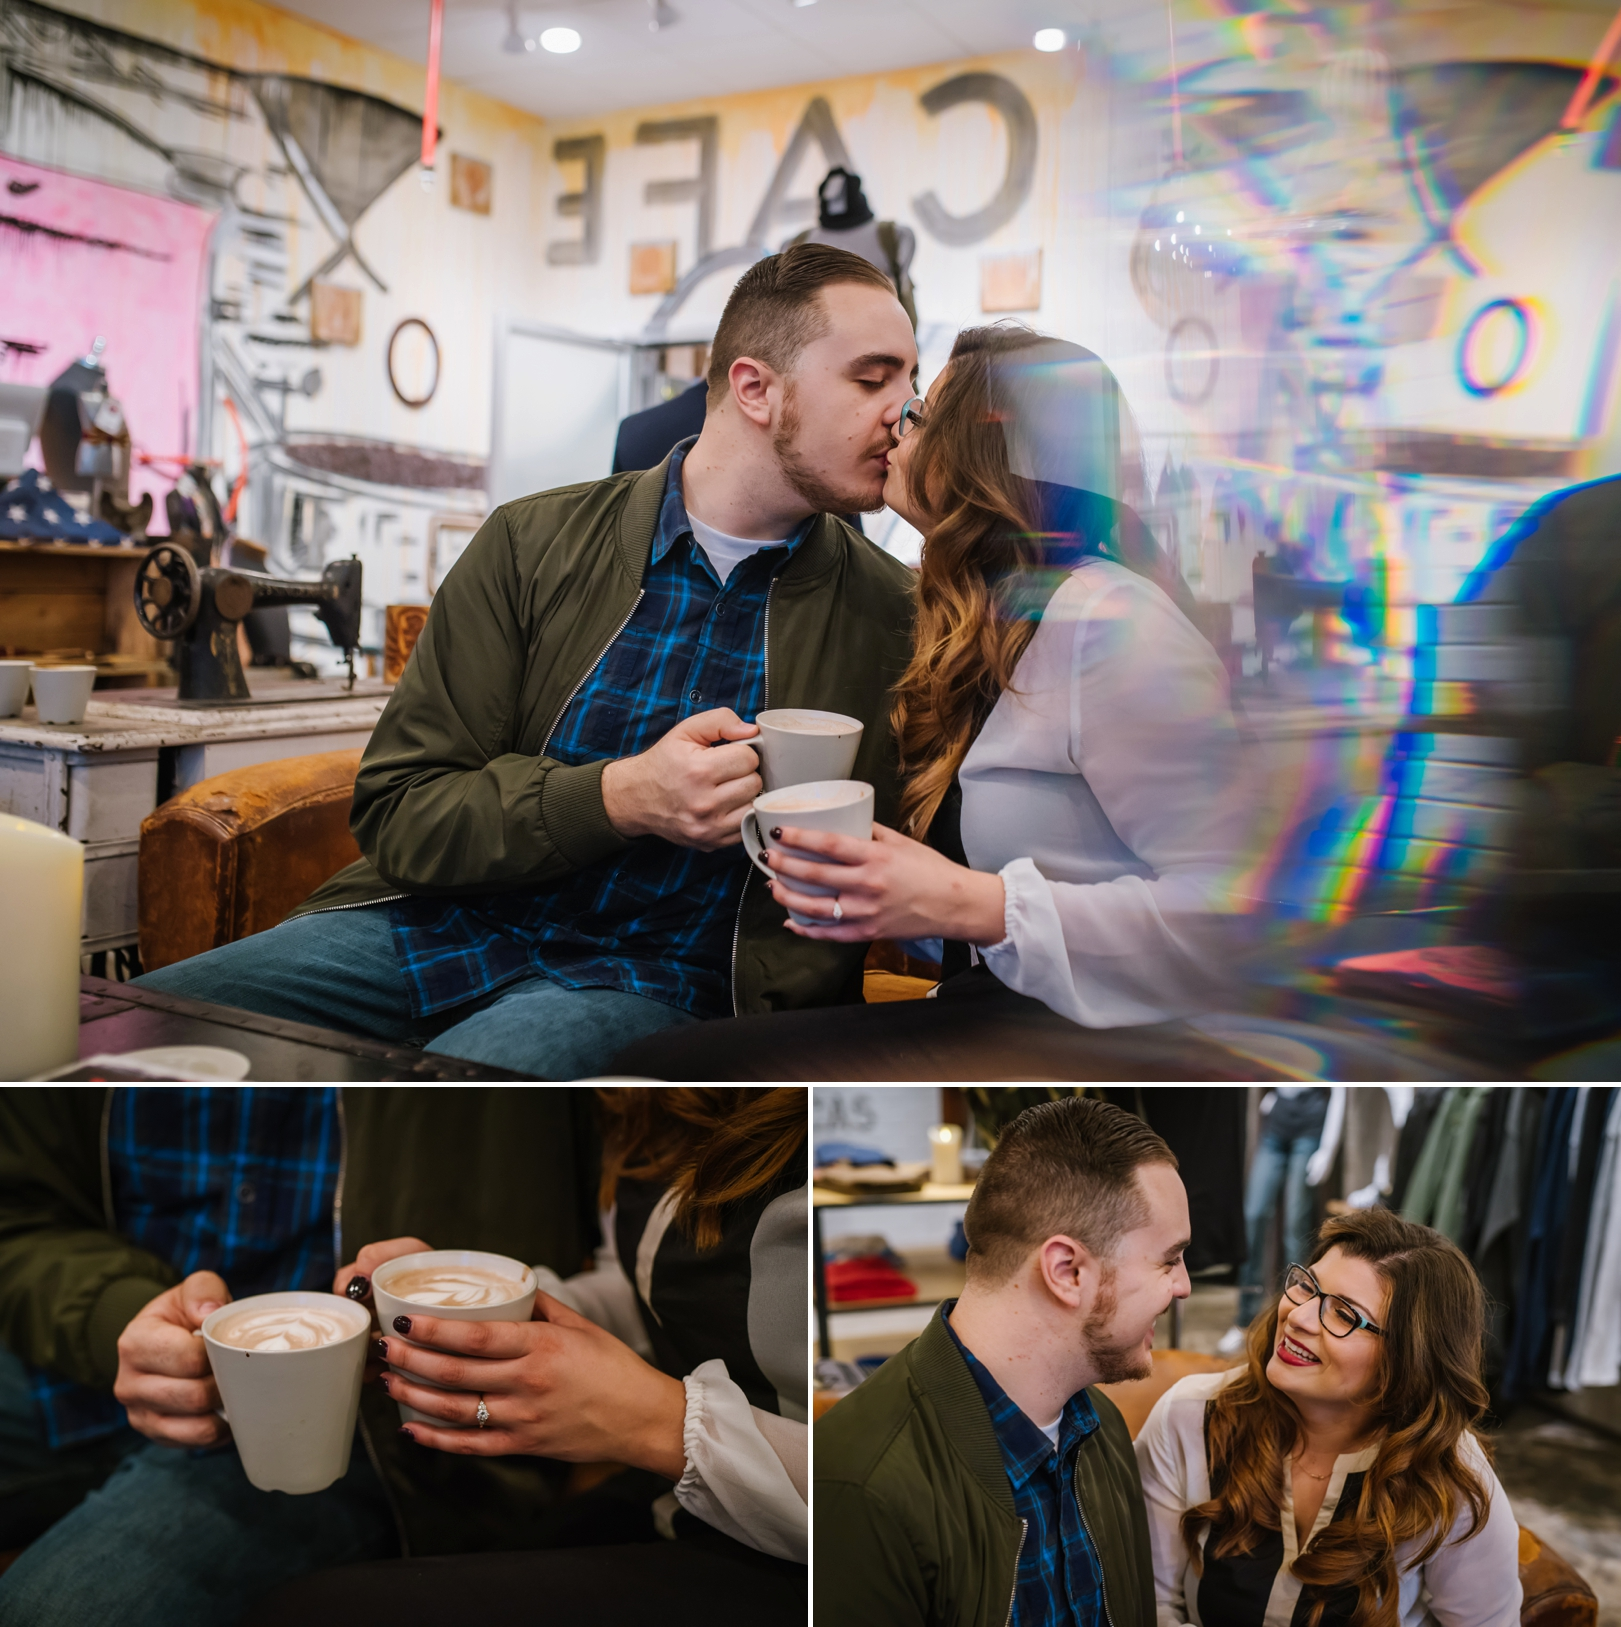 ashlee-hamon-wedding-photography-tampa-urban-cafe-engagement_0001.jpg